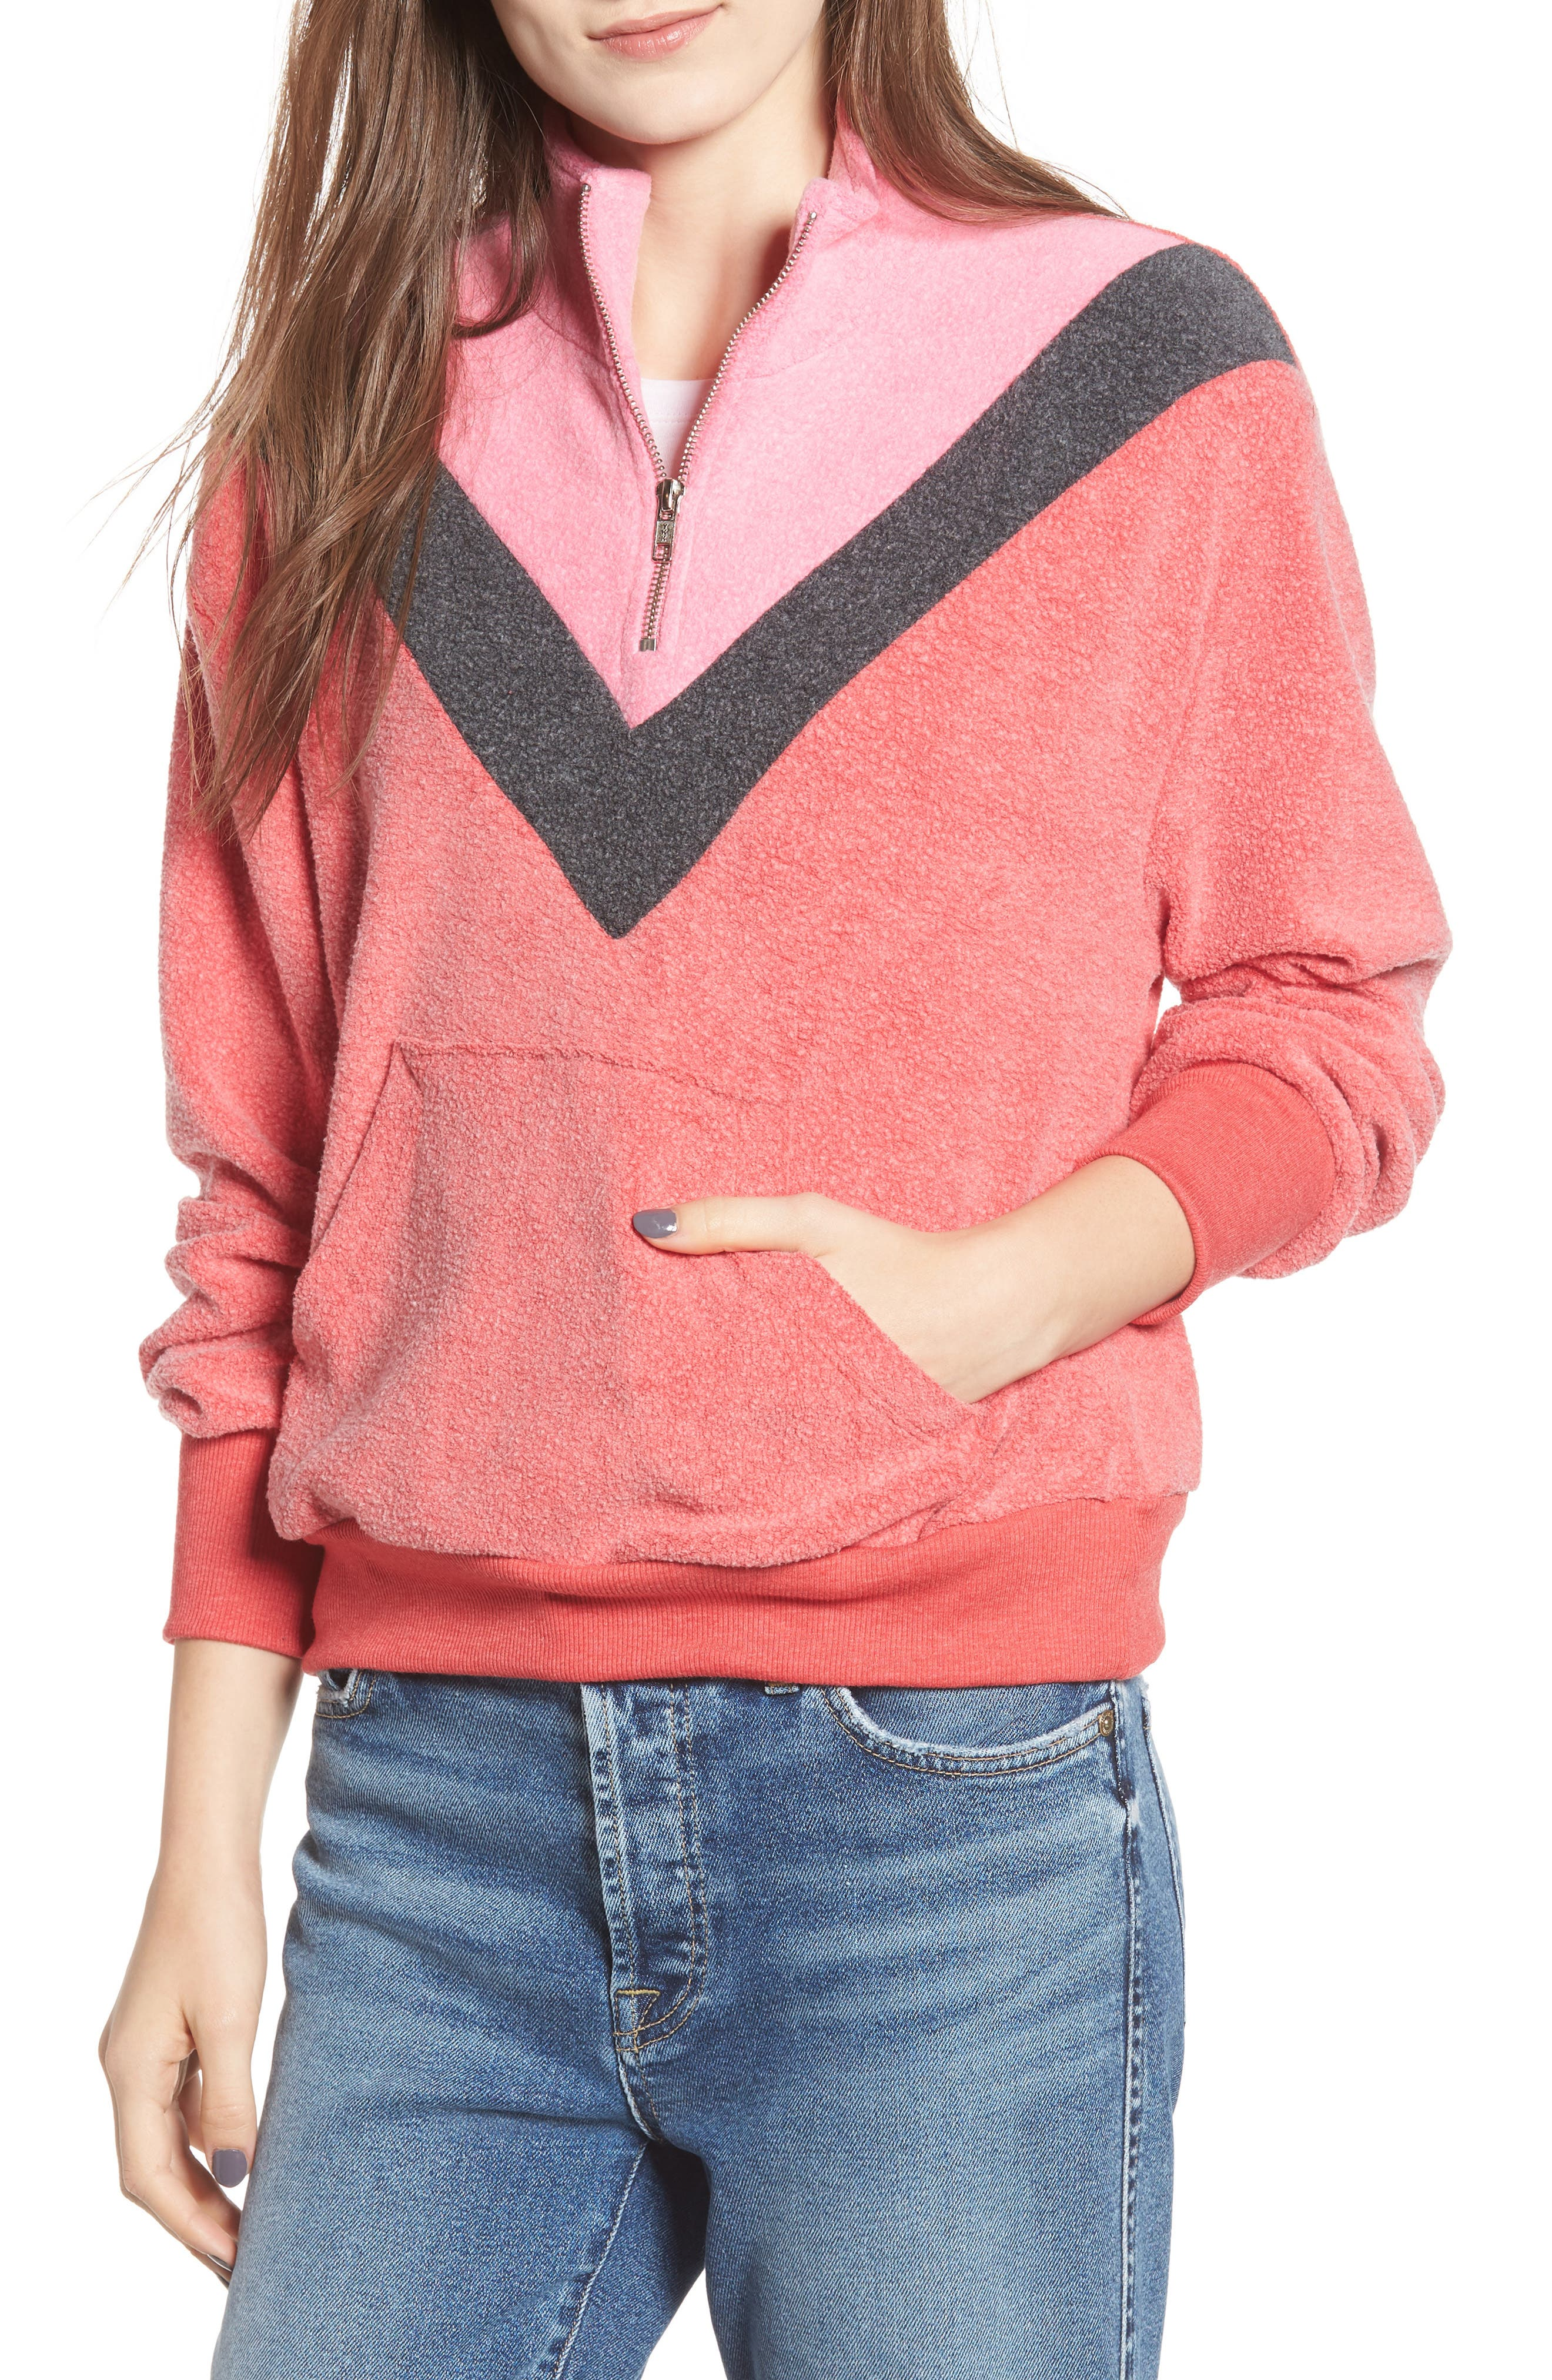 Soto Warm-Up Sweatshirt,                             Main thumbnail 1, color,                             SCARLET